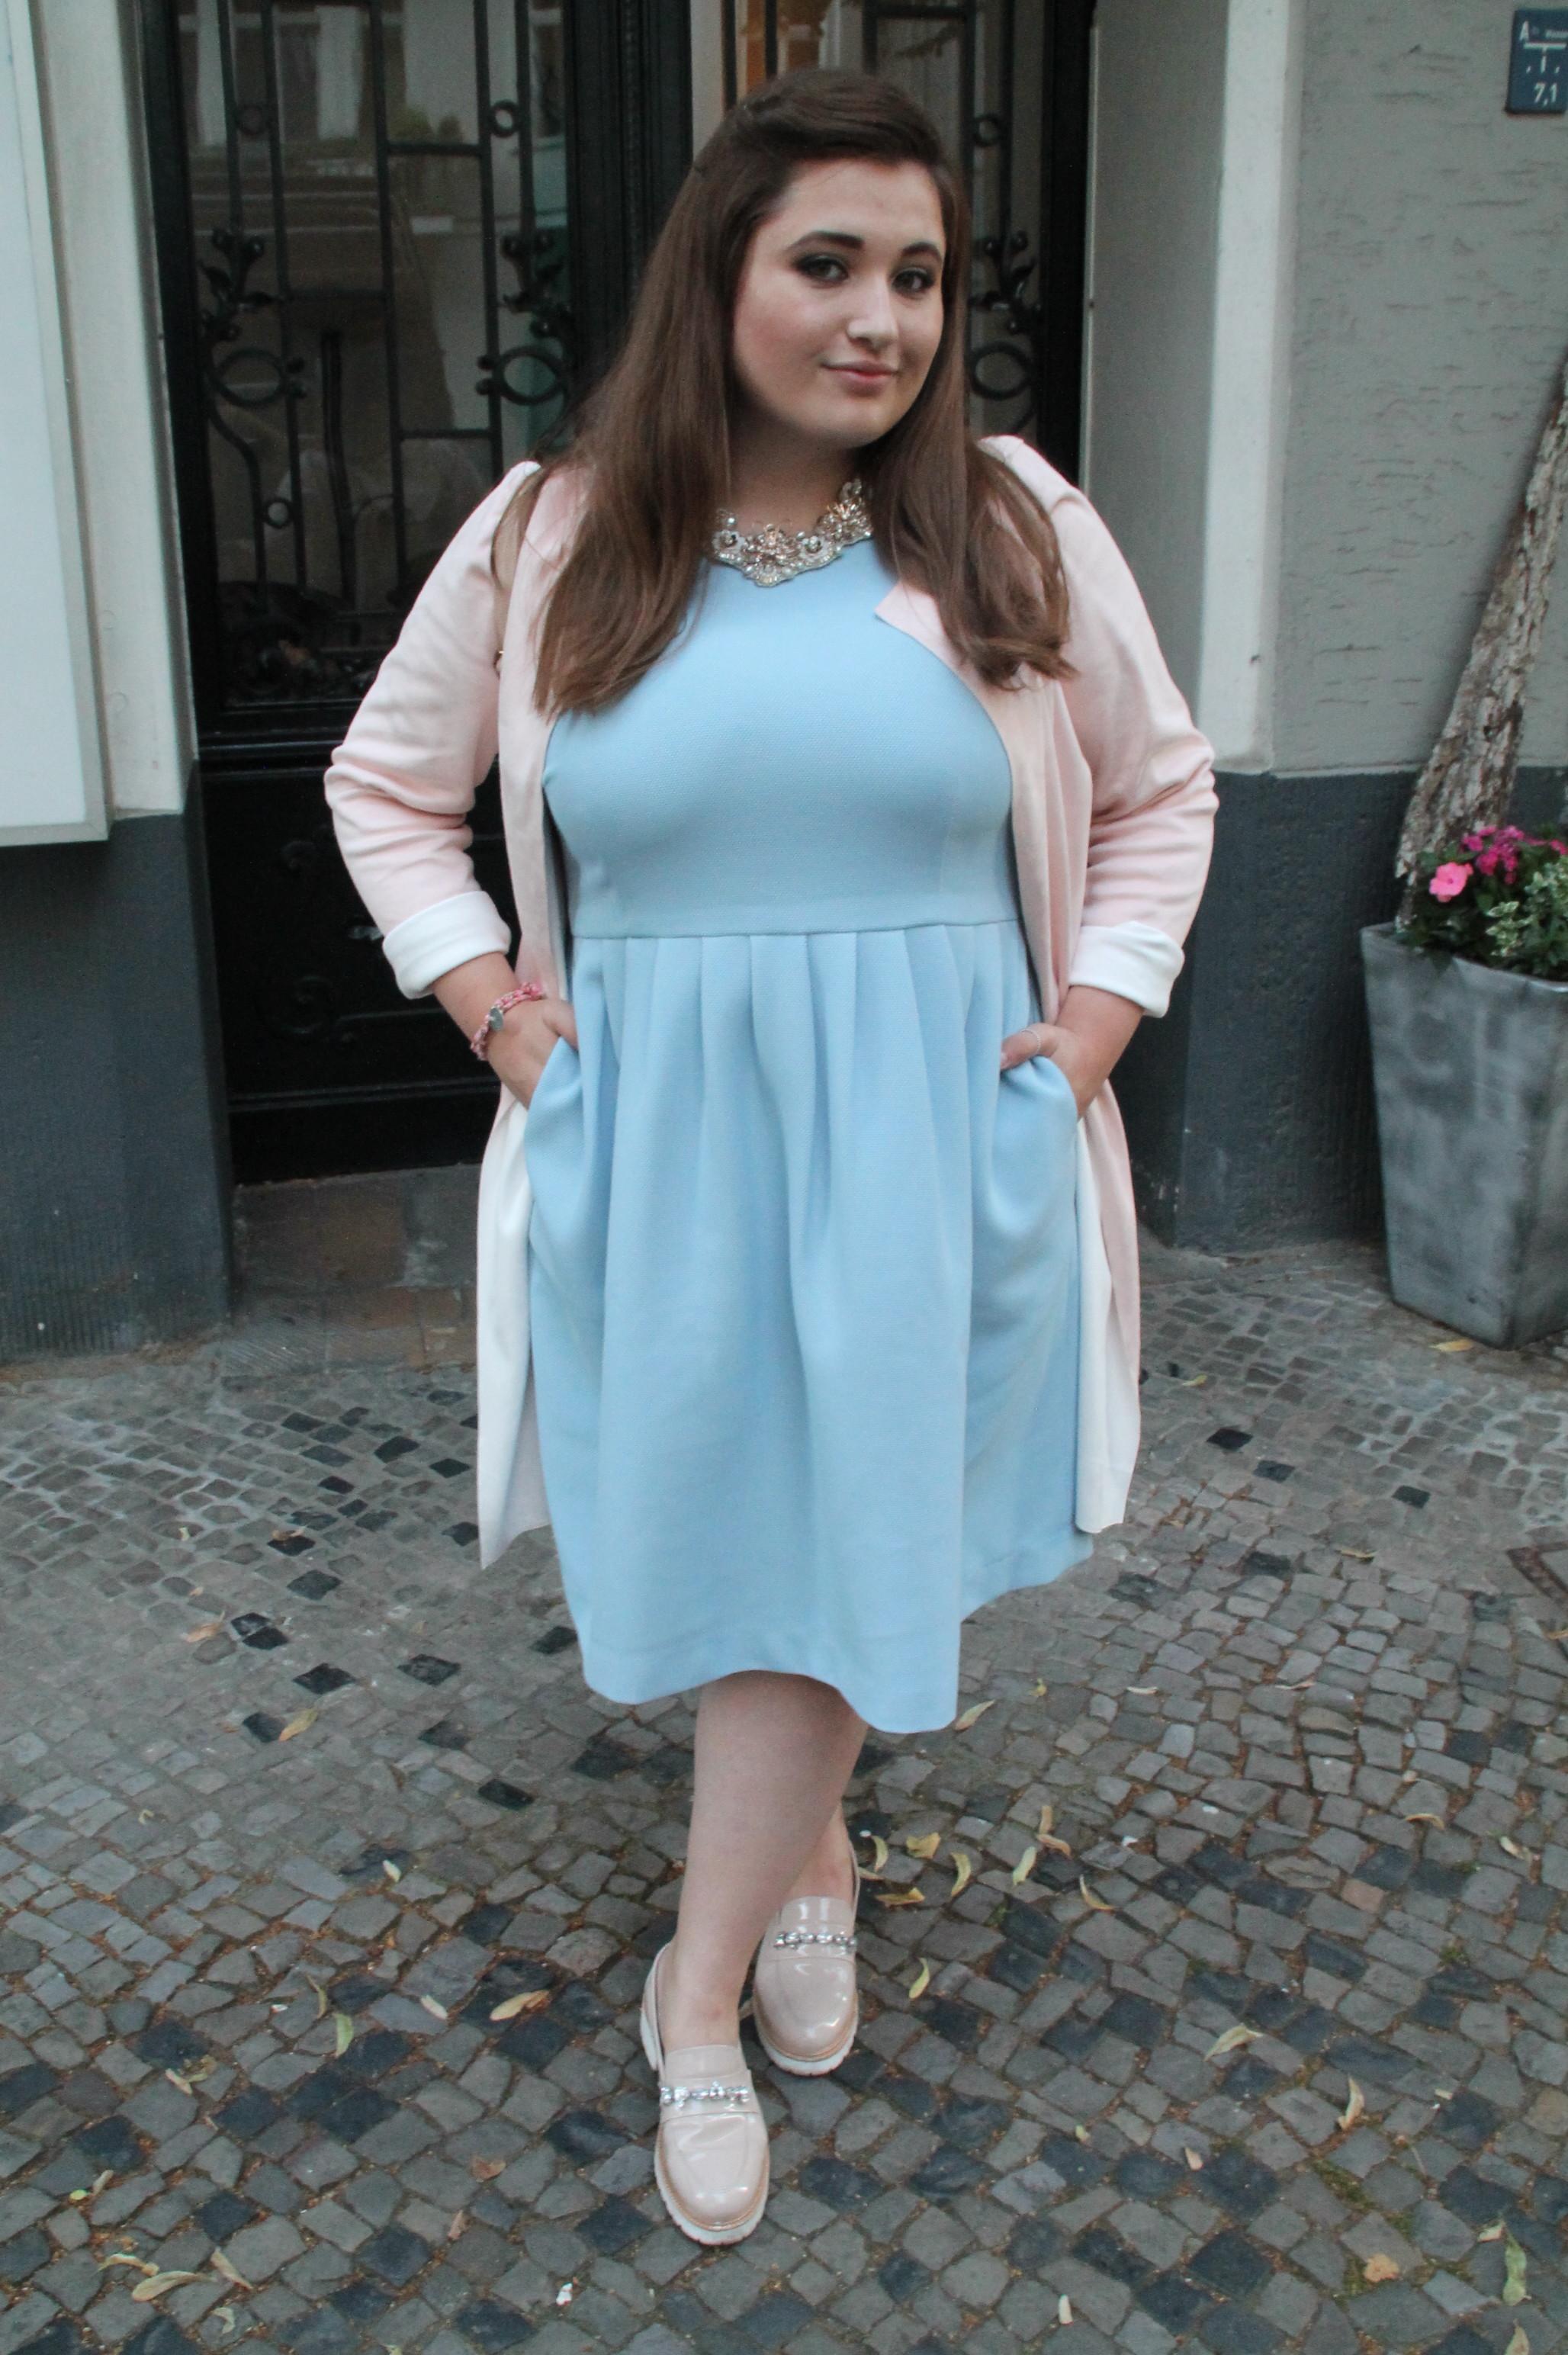 Jules im Kleid Figurtyp H